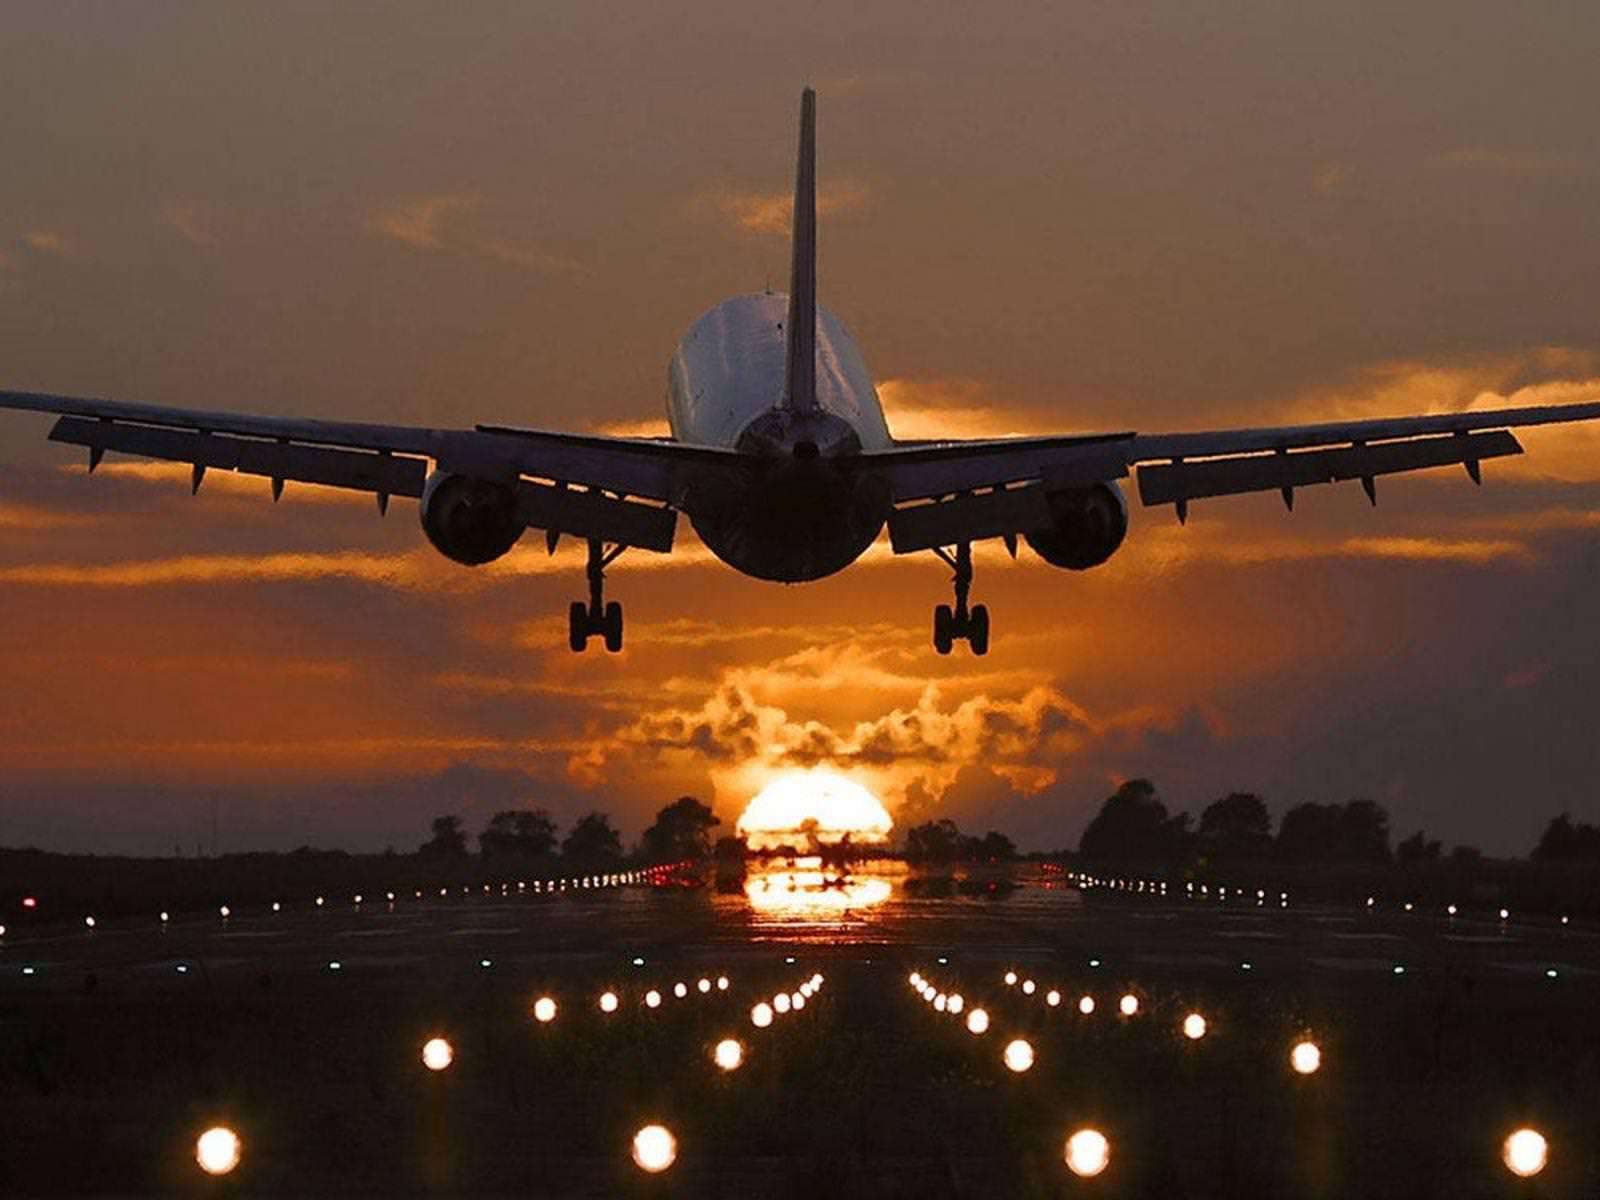 v_aeroportu_1600x1200